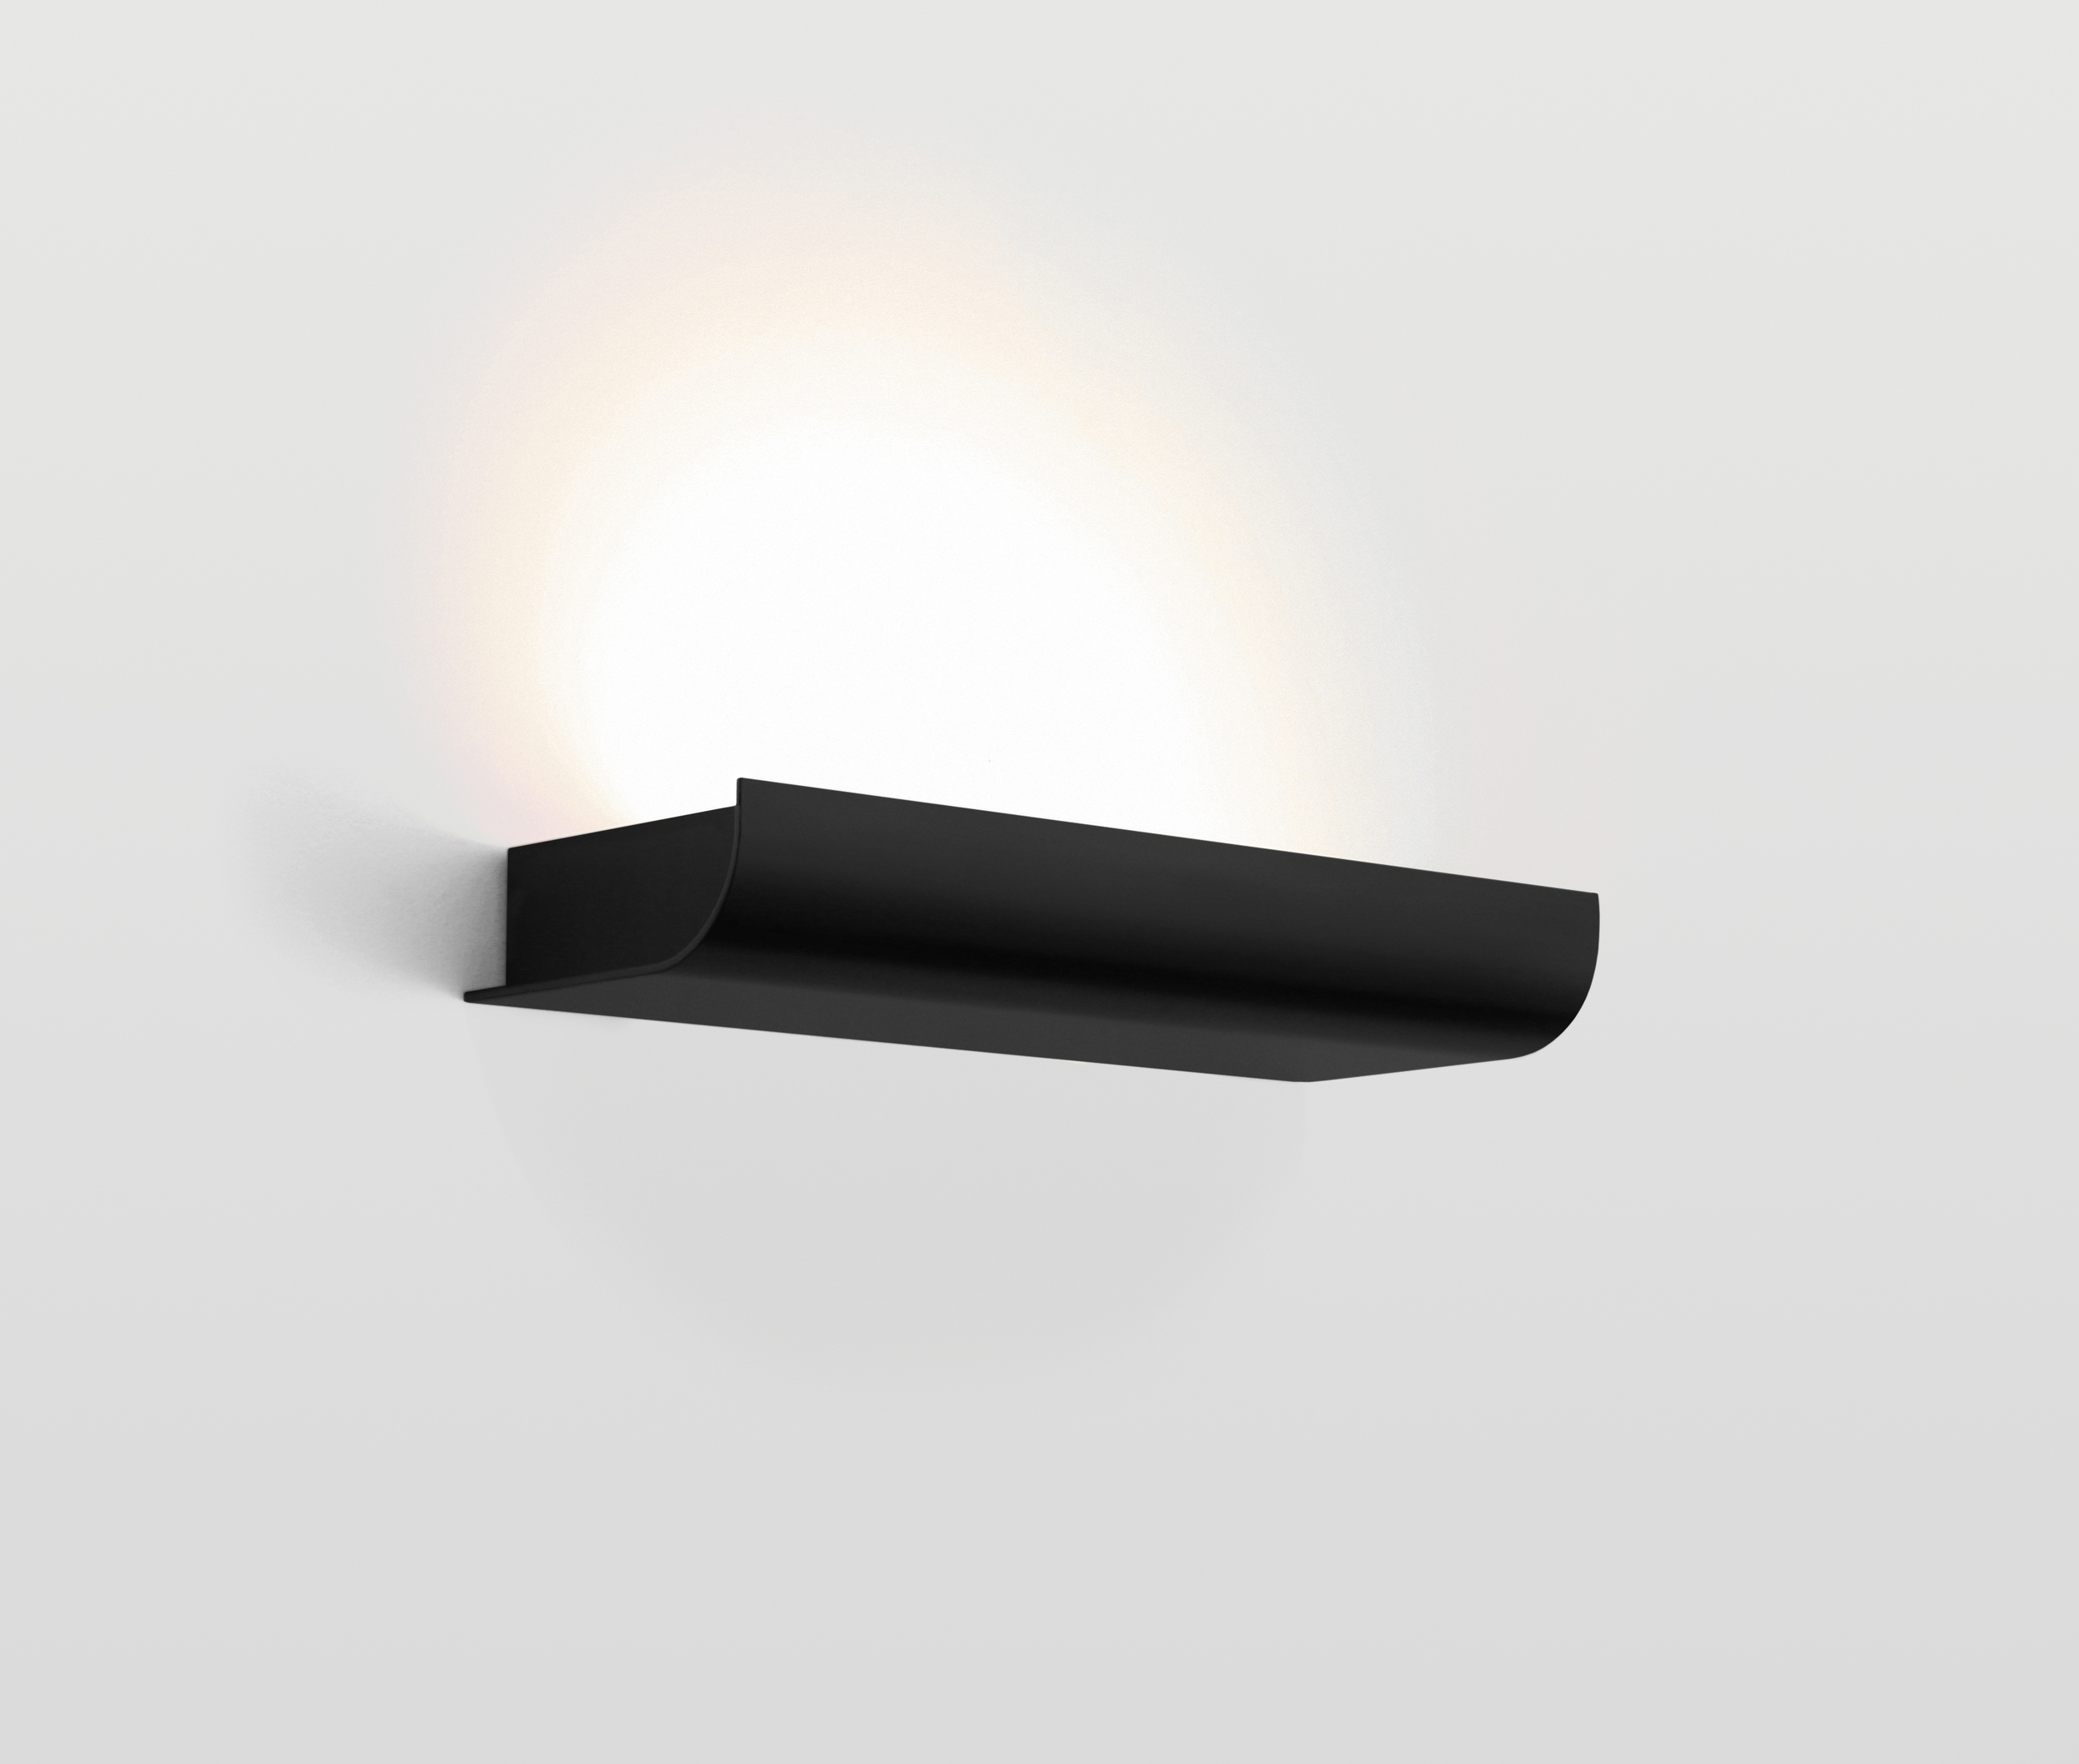 ISM_I Do_Wall Washer_Large_Flat Black.jpg